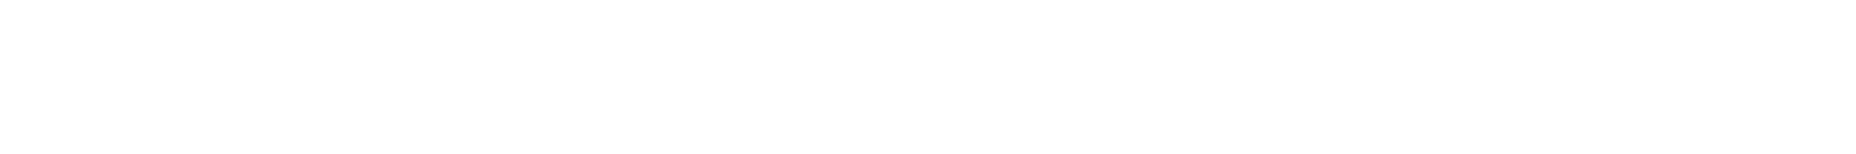 Hobie MirageDrive Headline